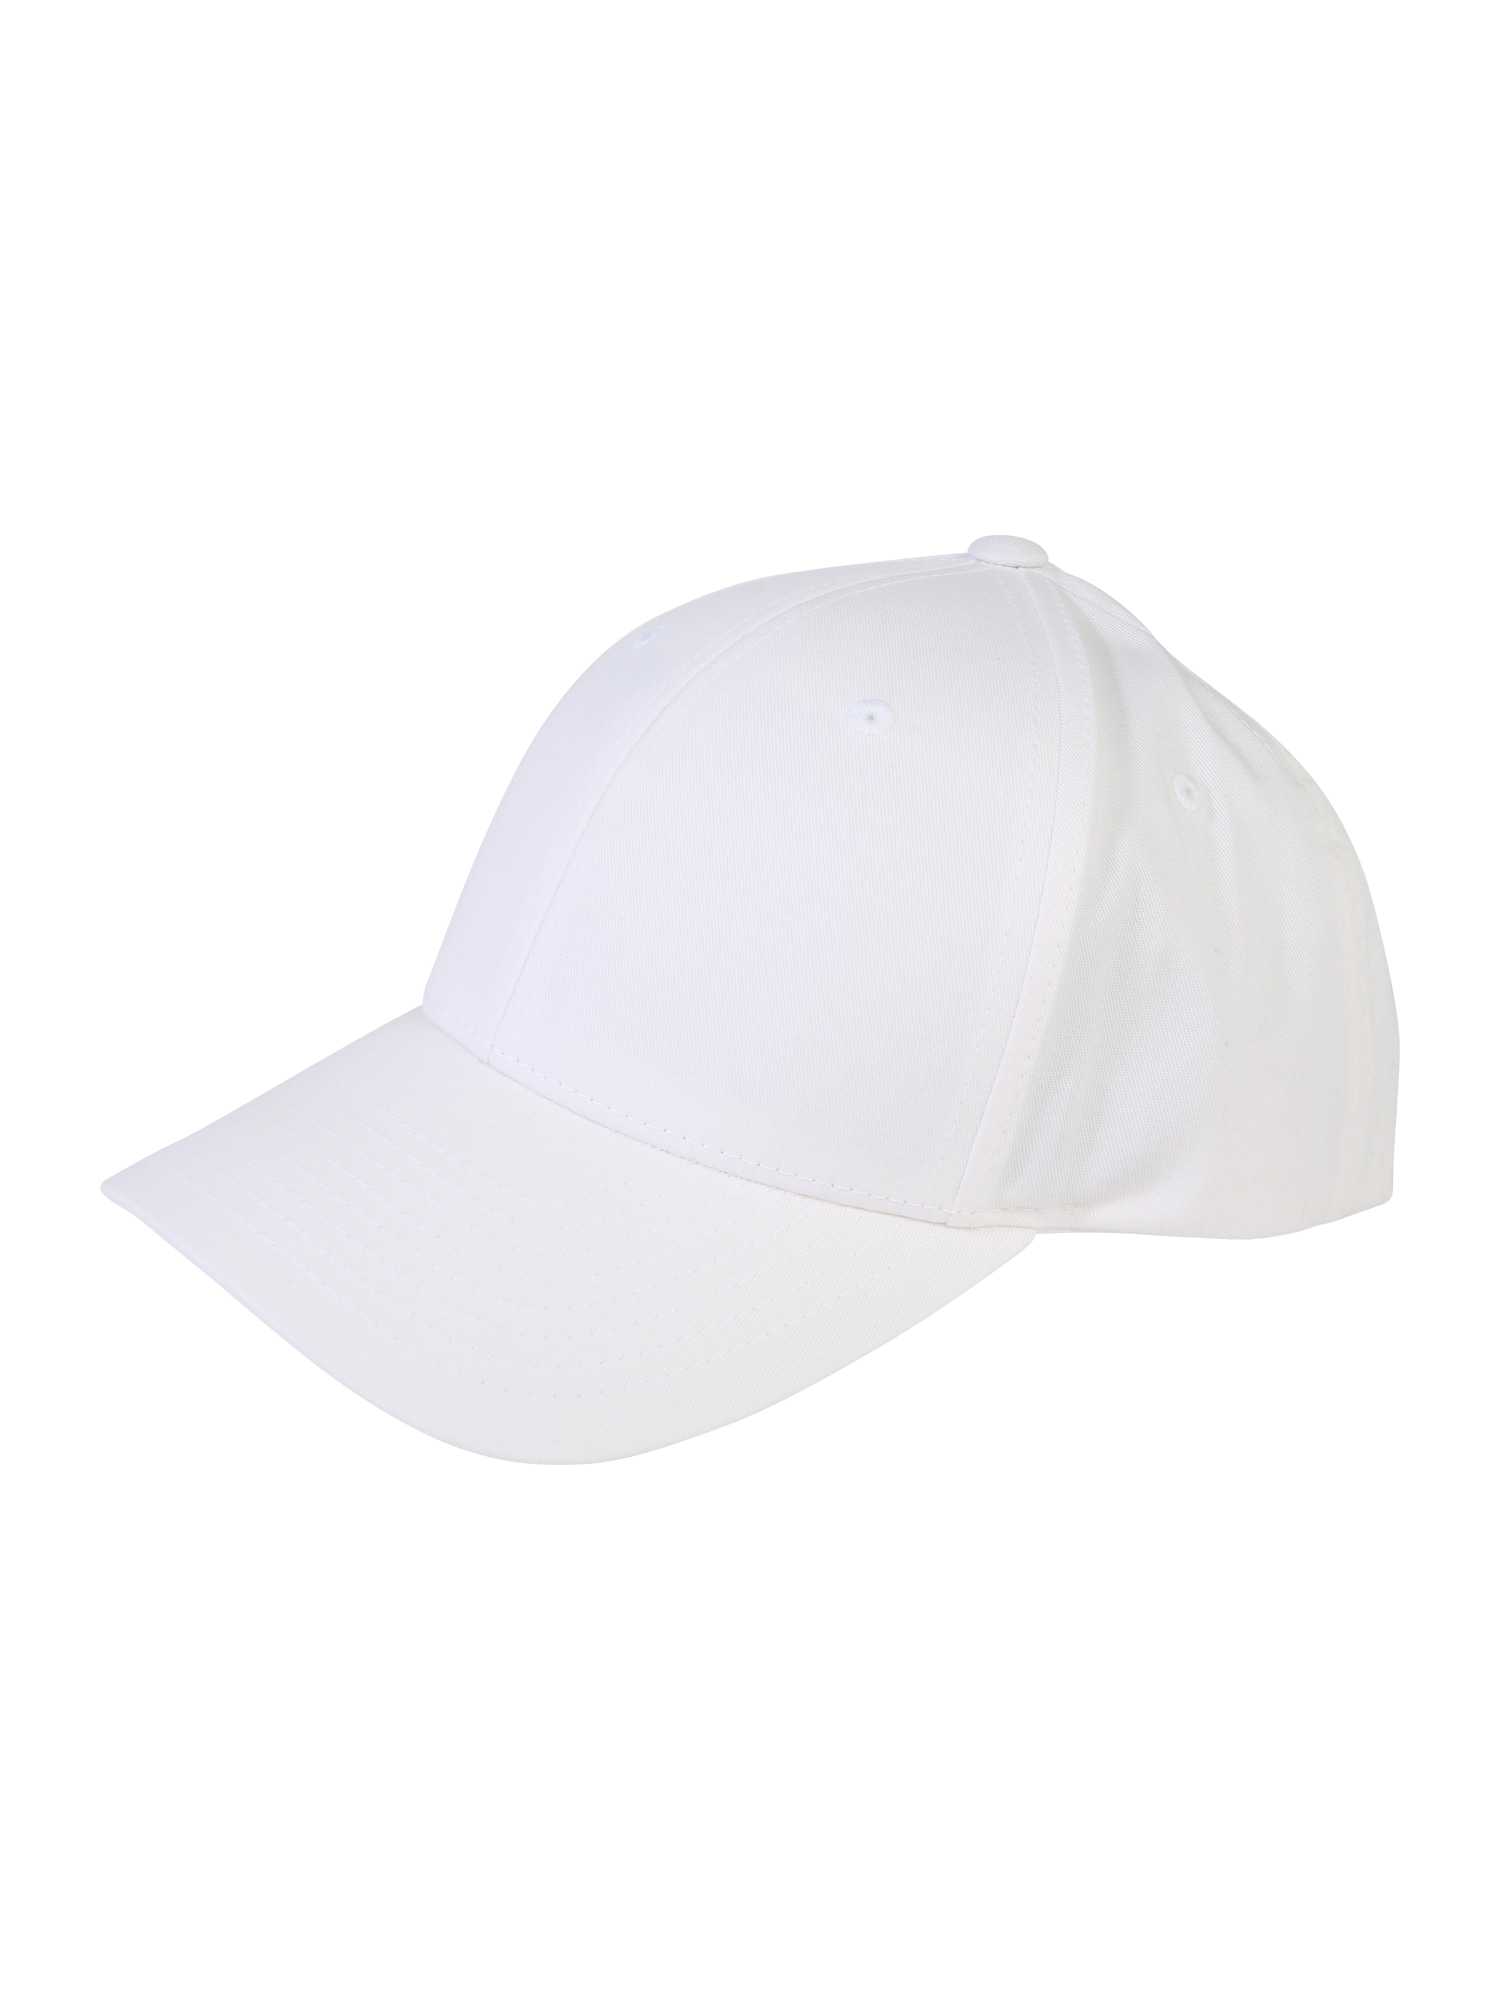 Kšiltovka Curved Classic Snapback bílá Flexfit